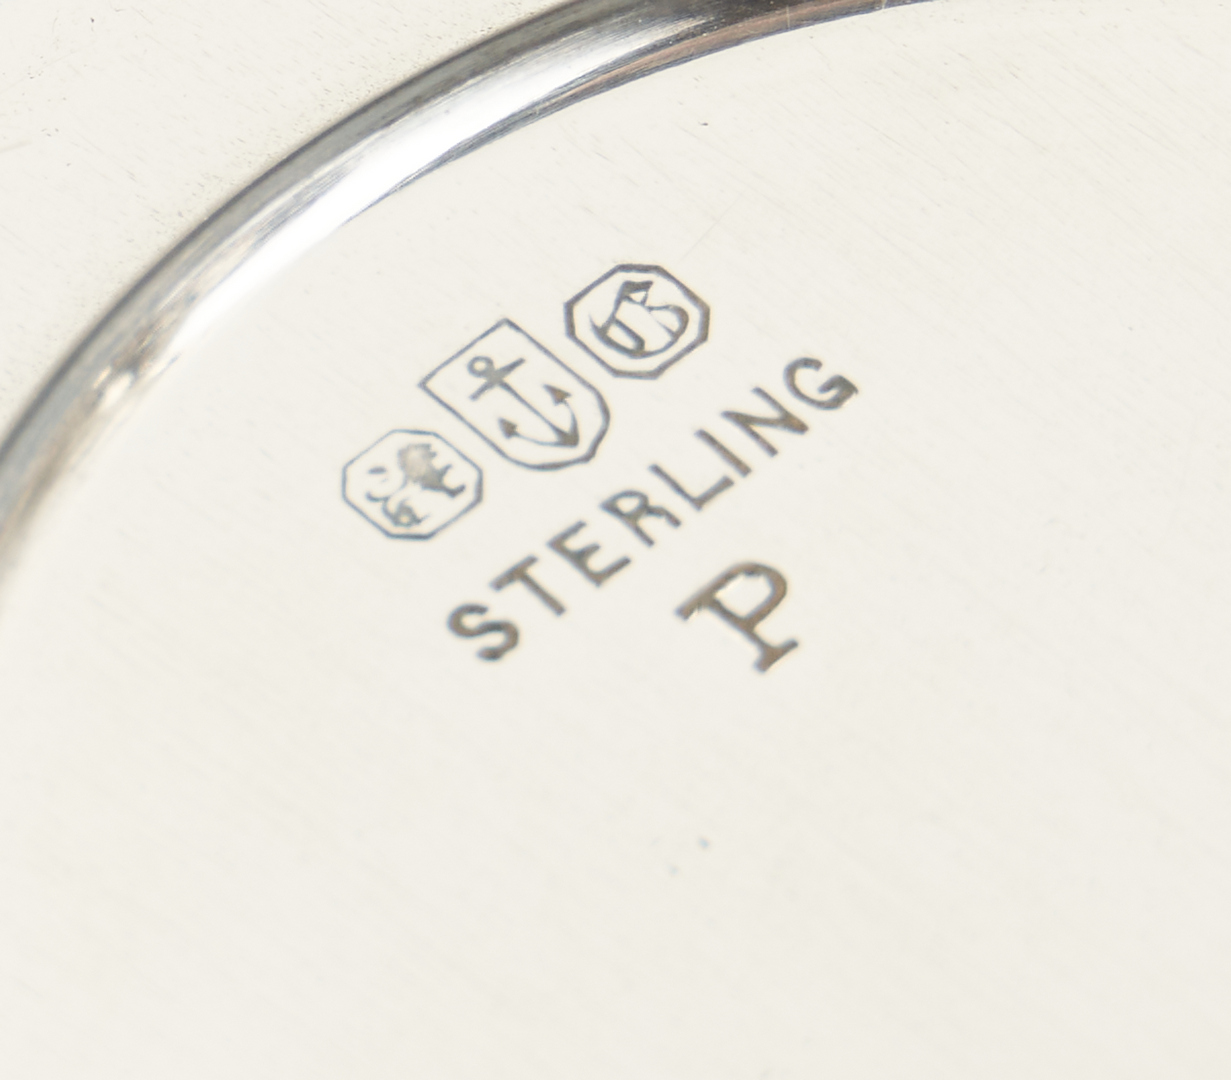 Lot 80: Gorham Sterling Silver Tea Service w/ Tray, 7 Pcs.